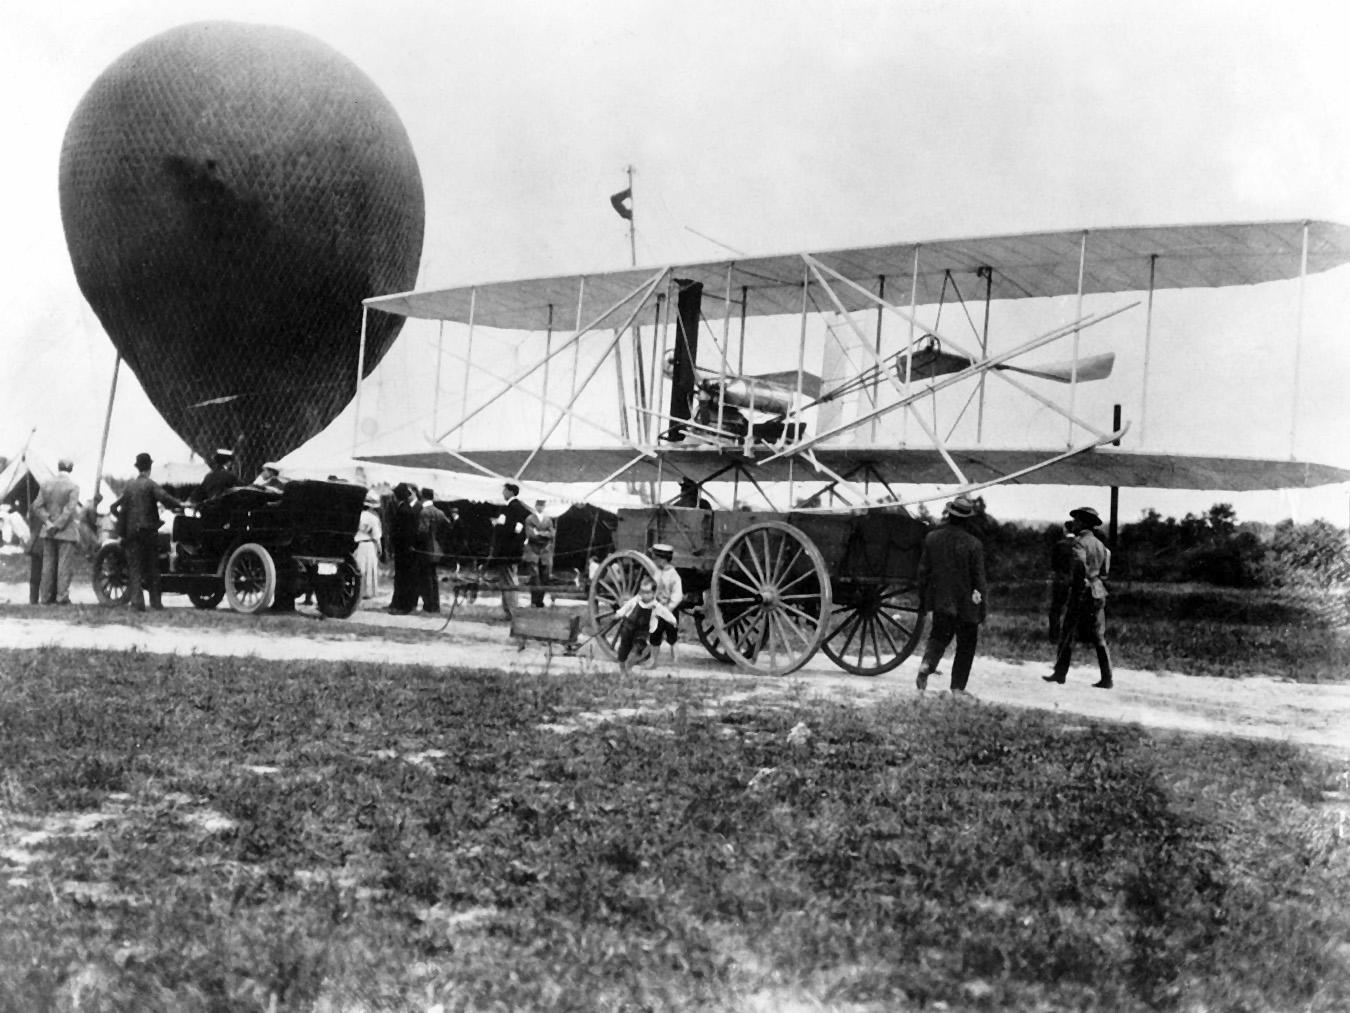 http://upload.wikimedia.org/wikipedia/commons/8/80/Wright_Military_Flyer_arrives_at_Fort_Myer_VA_DA-SD-05-00659.JPEG